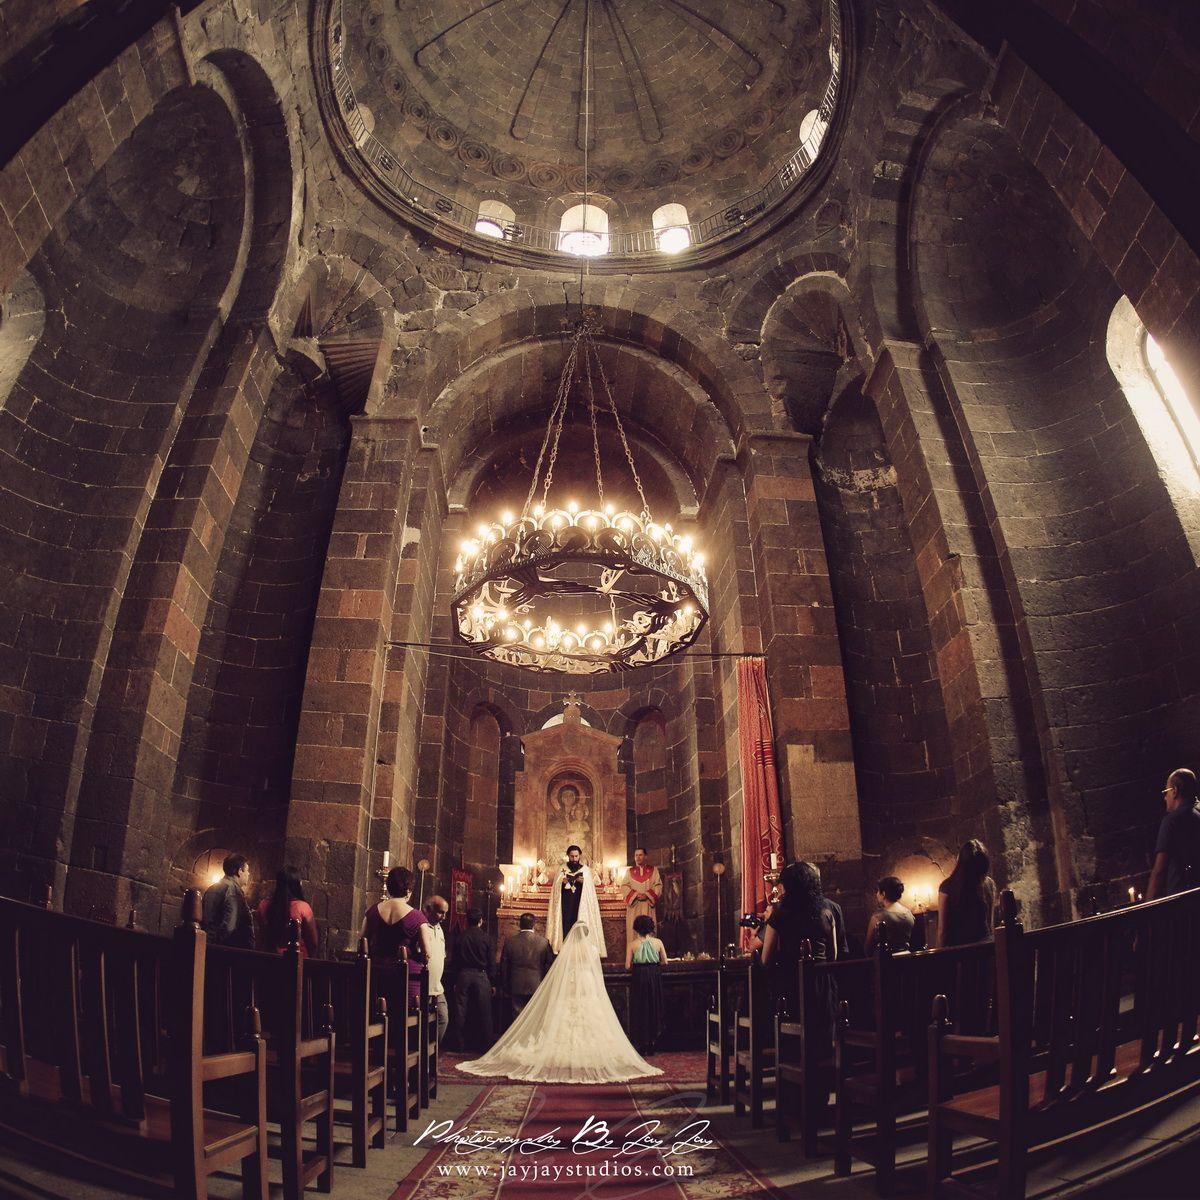 A church wedding in armenia beautiful stuff in this post a church wedding in armenia beautiful stuff in this post publicscrutiny Choice Image